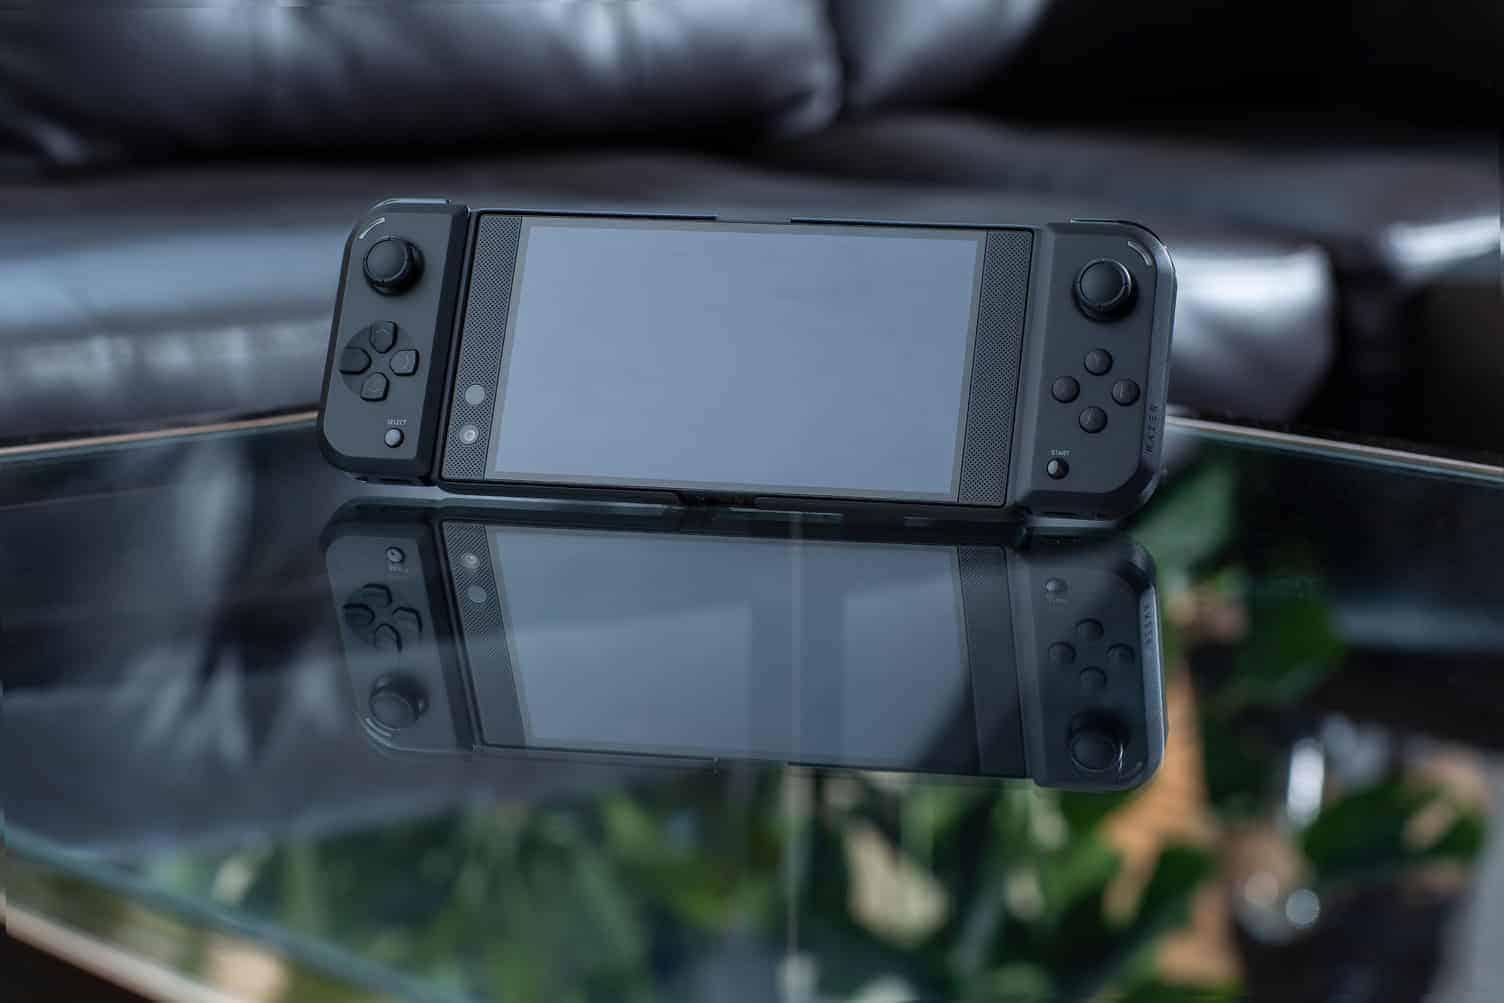 Razer Junglecat Mobile Game Controller 3